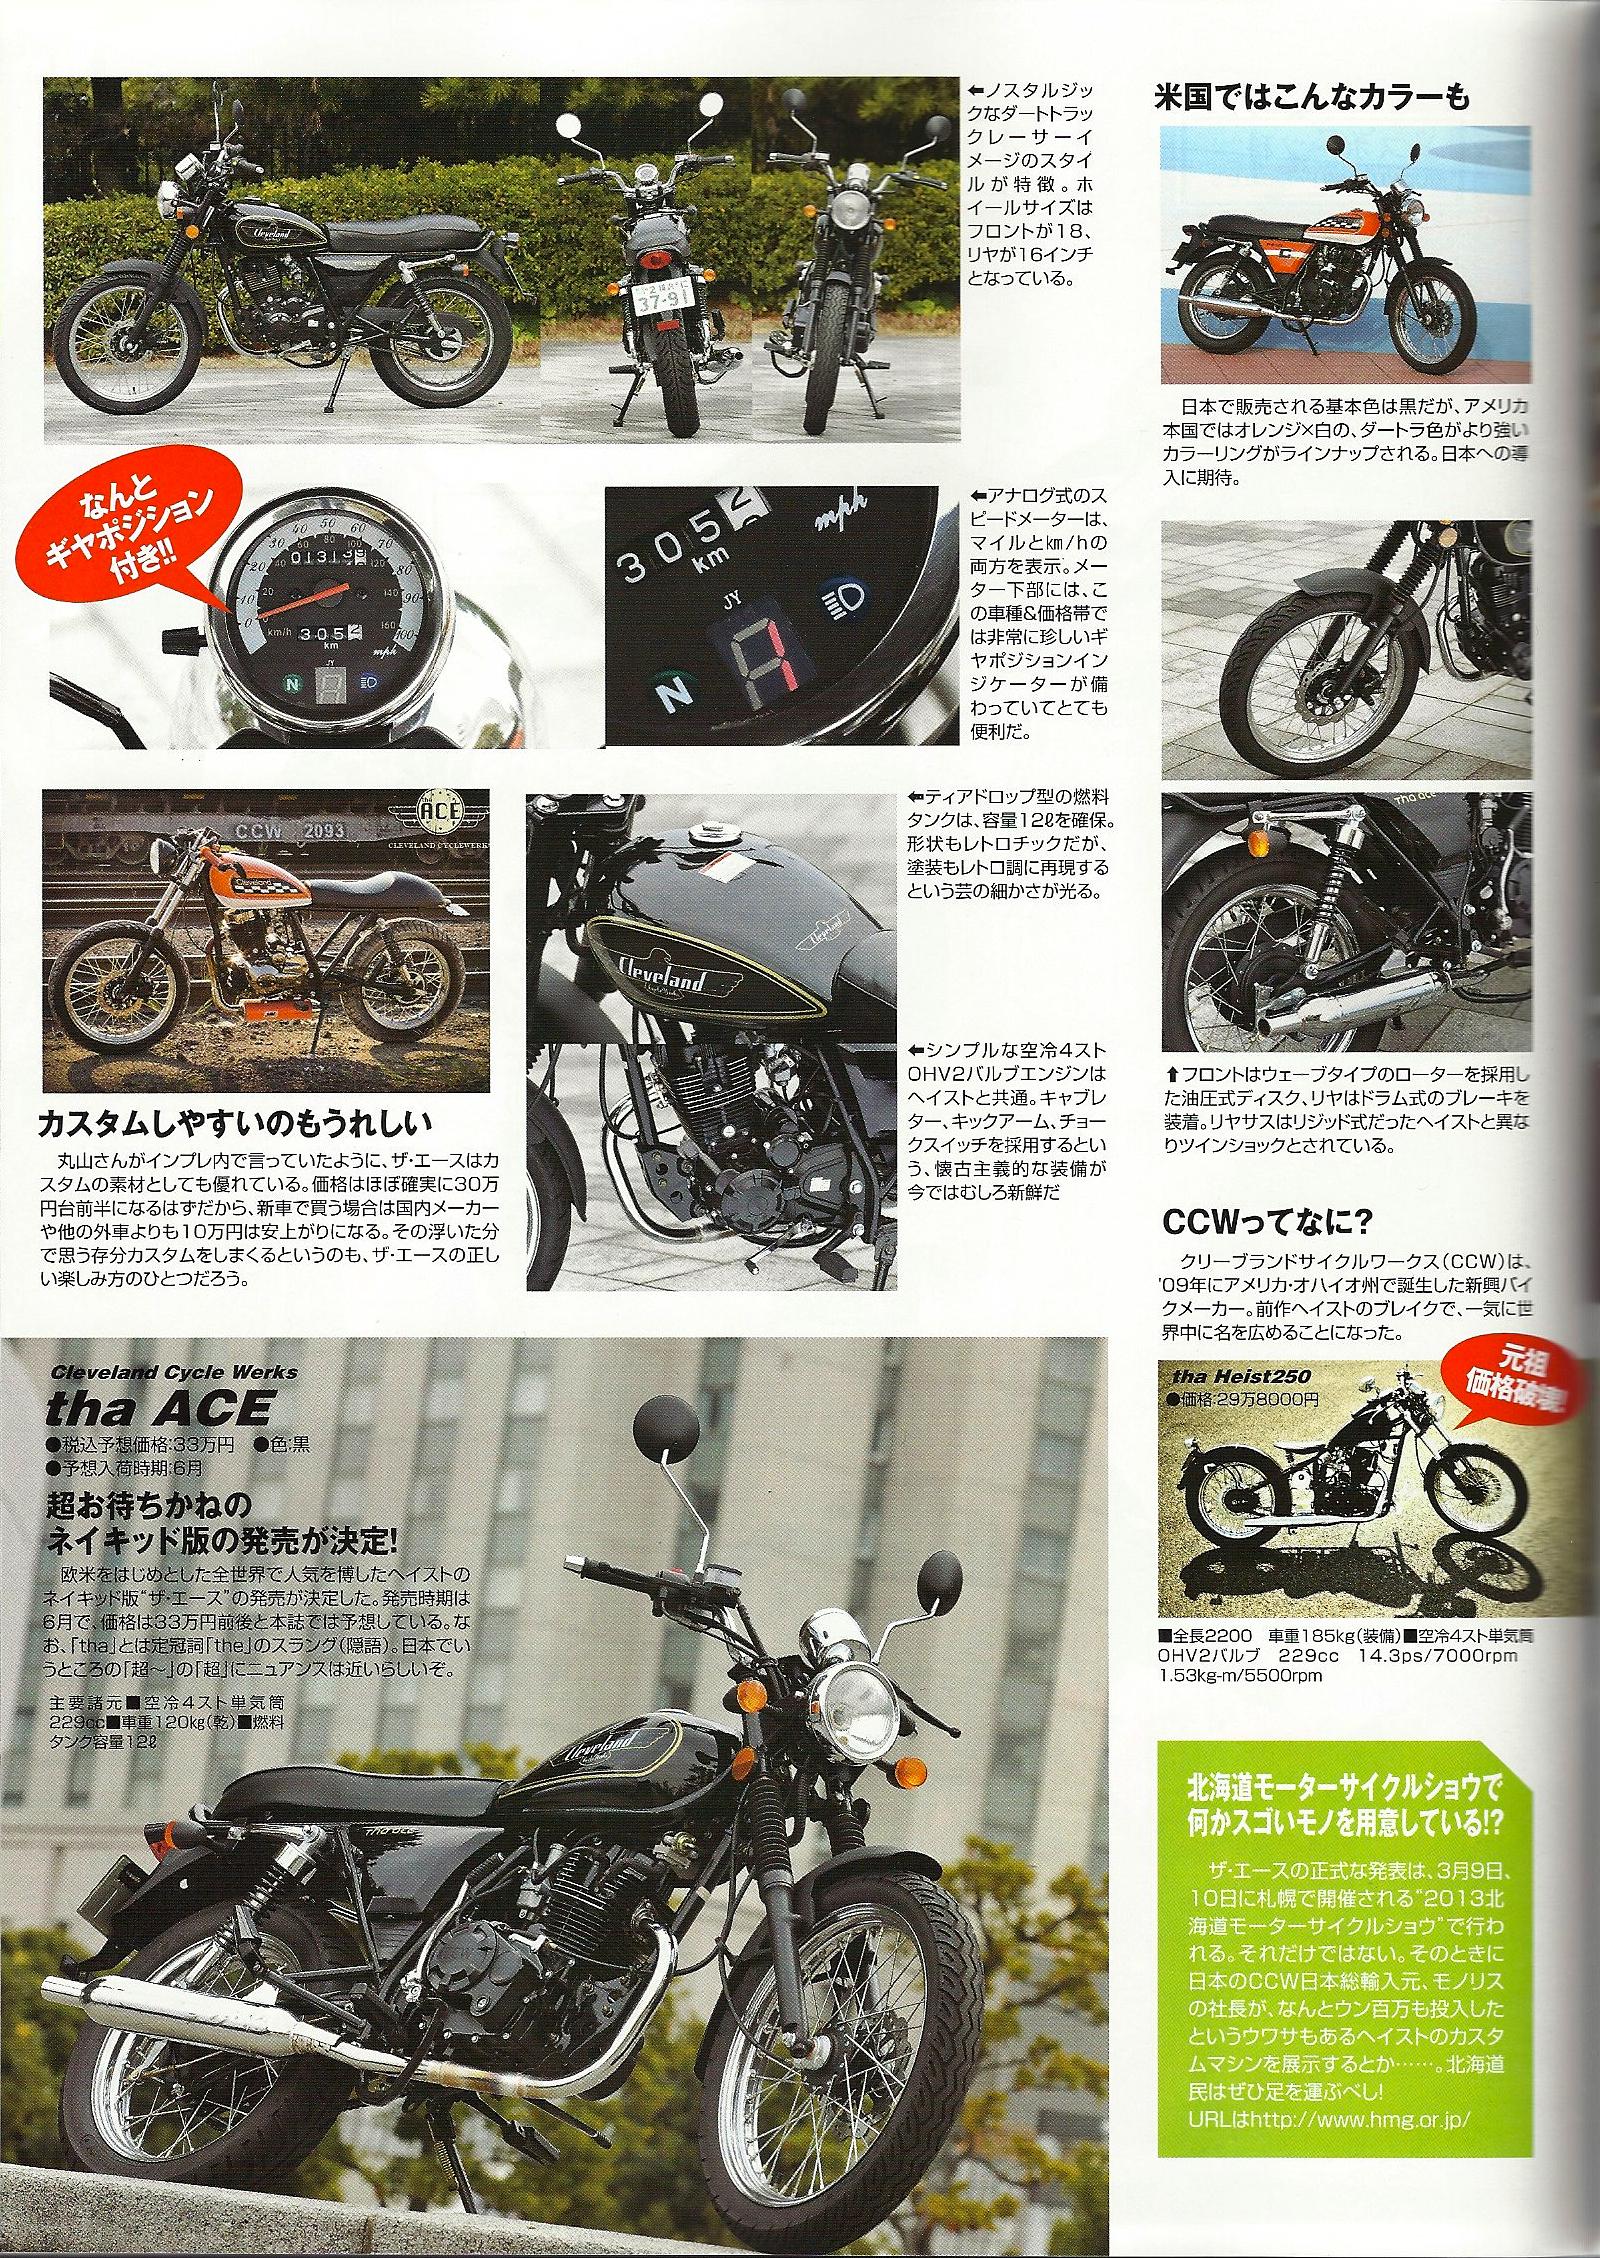 Young-Machine-Ace-002.jpg.jpg